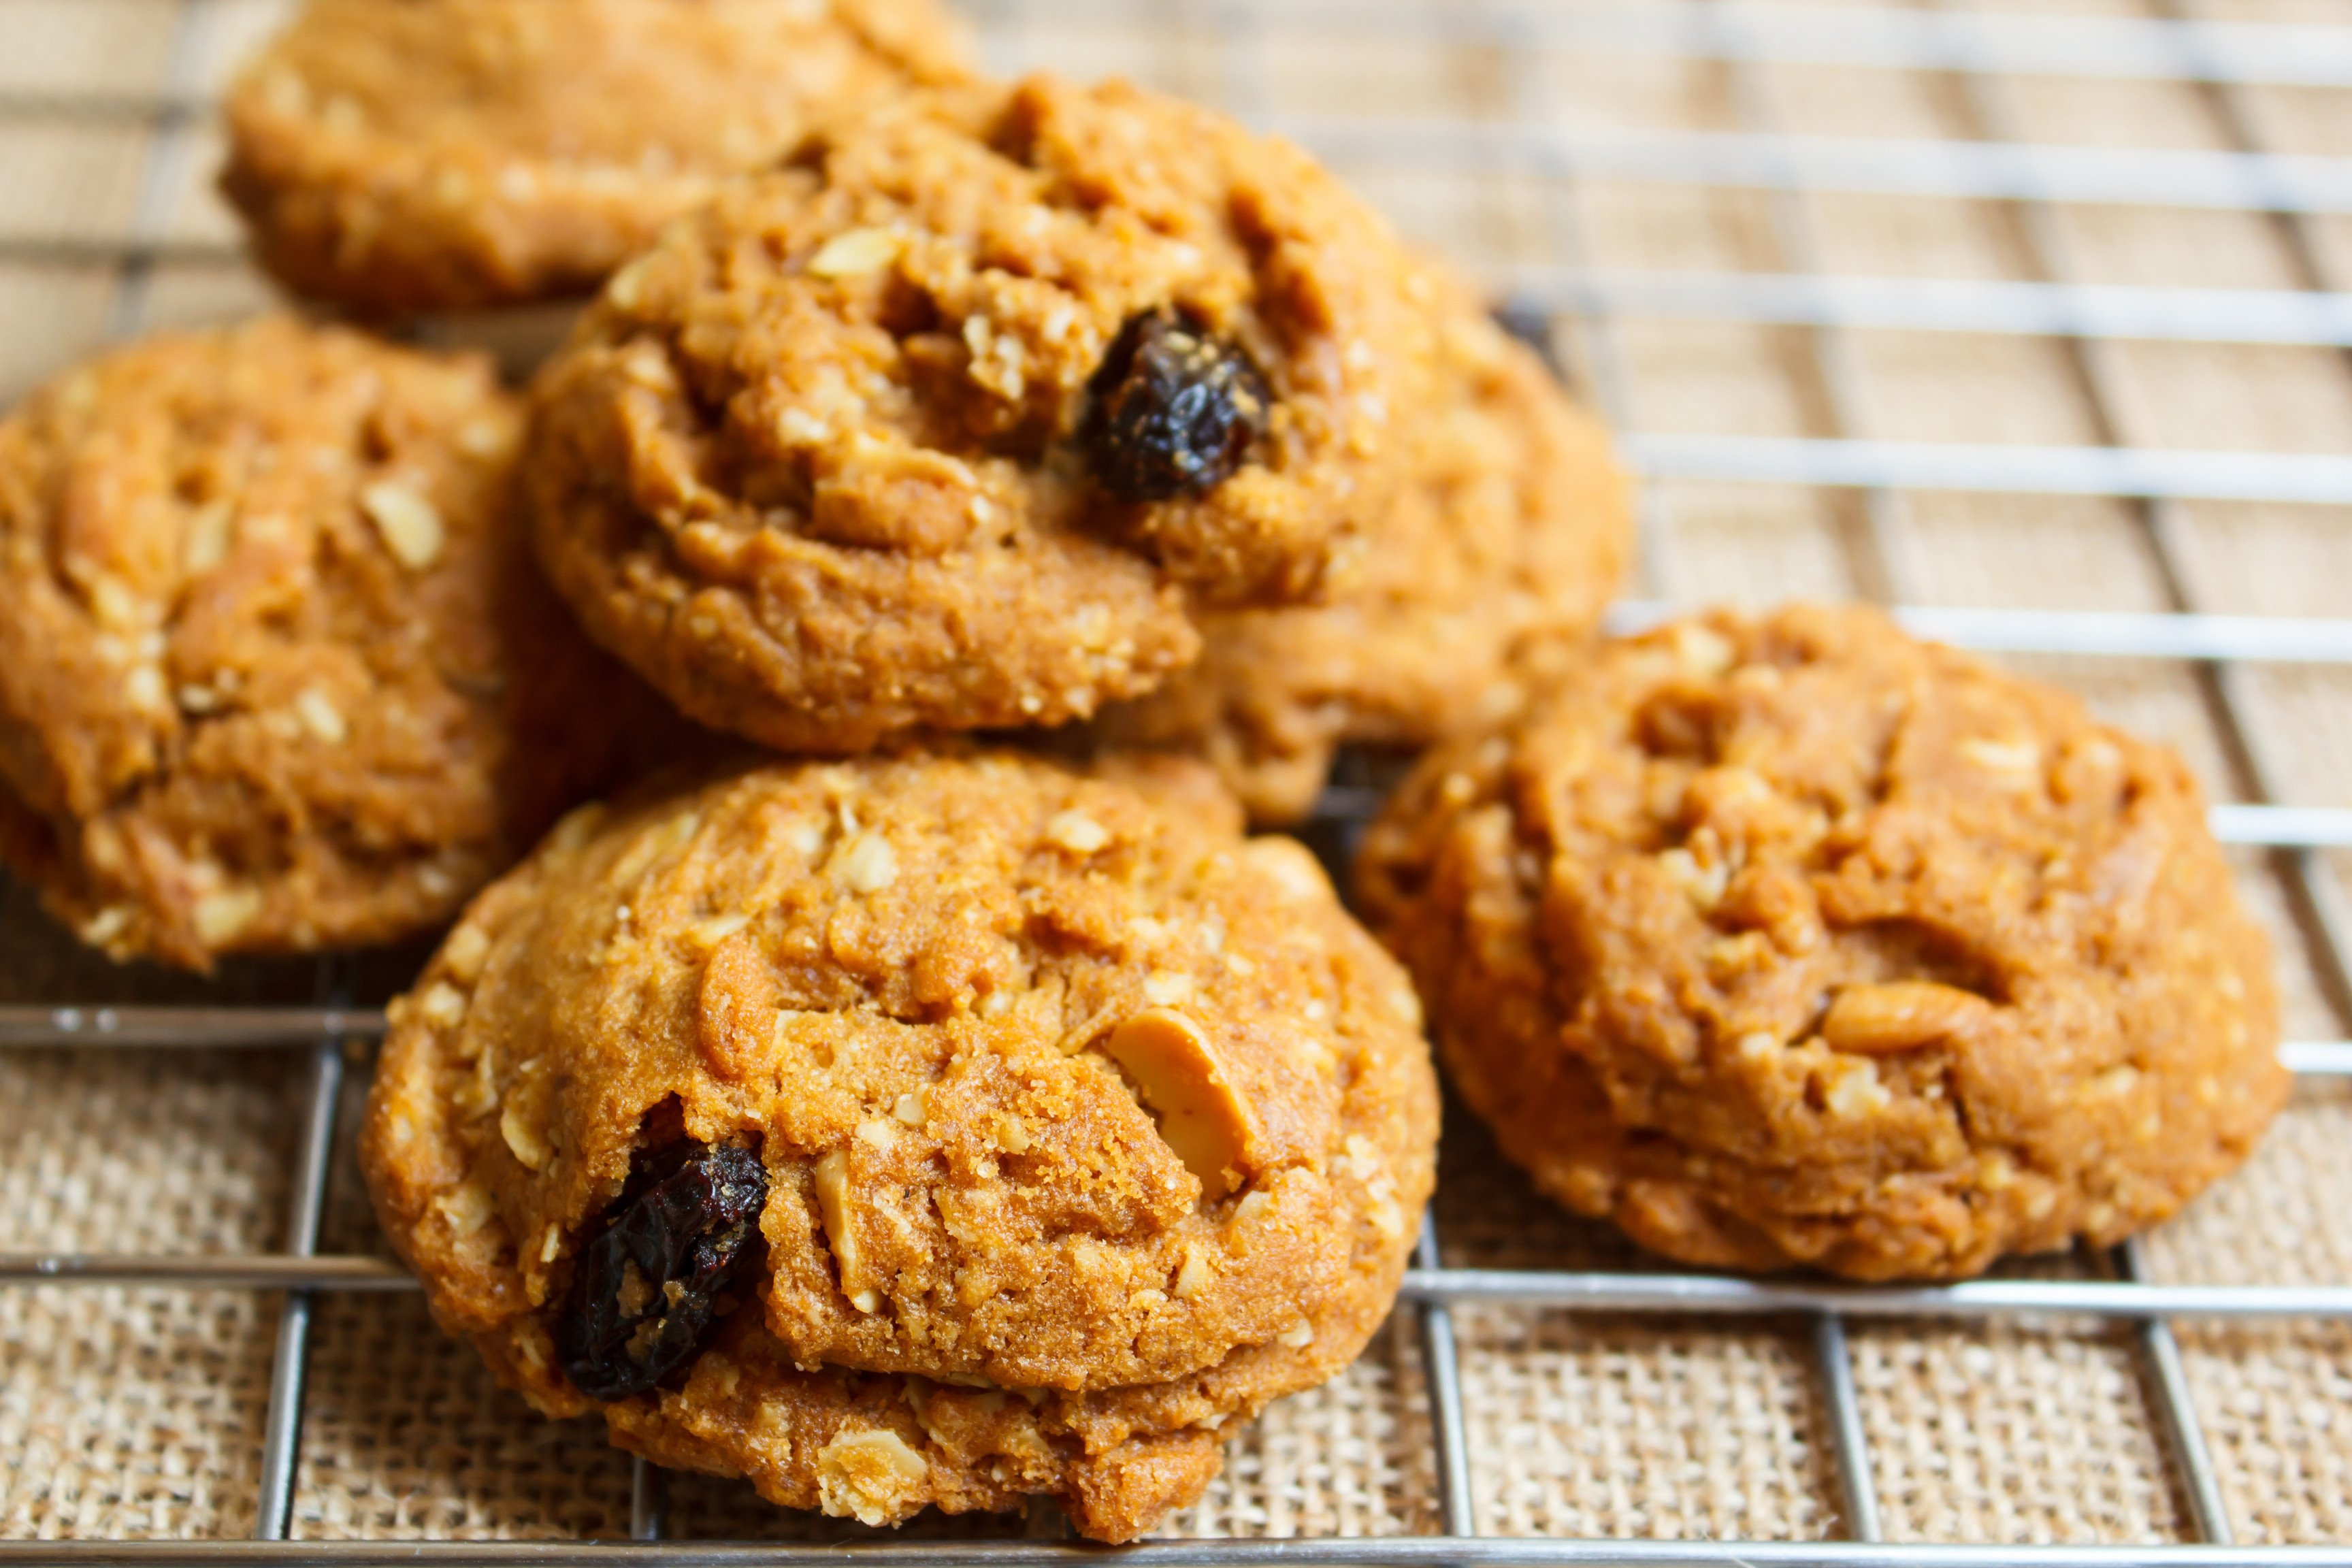 Oatmeal Cookies For Diabetics  Oatmeal Cookie Recipe for Diabetics